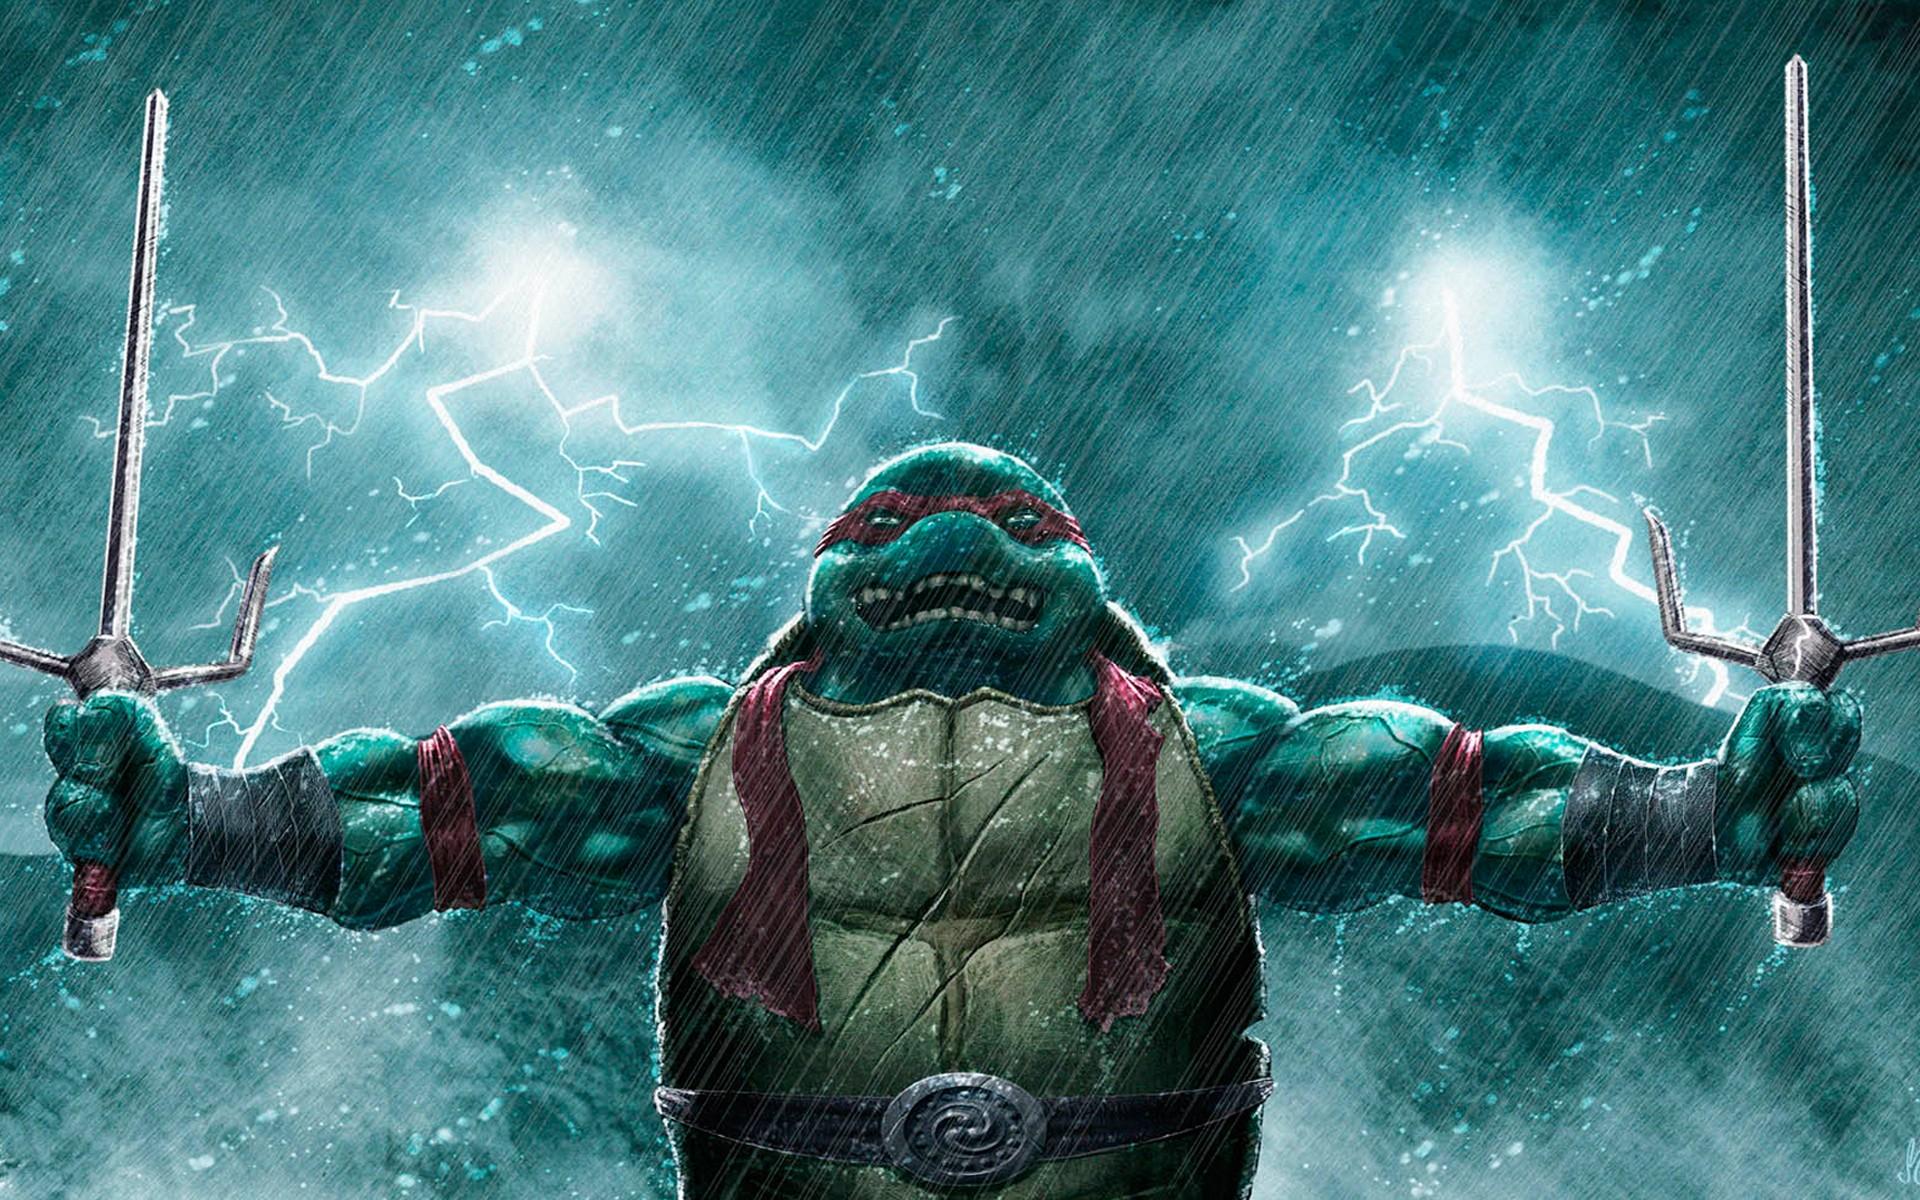 fondos-de-pantalla-animados-tortugas-ninja (1)